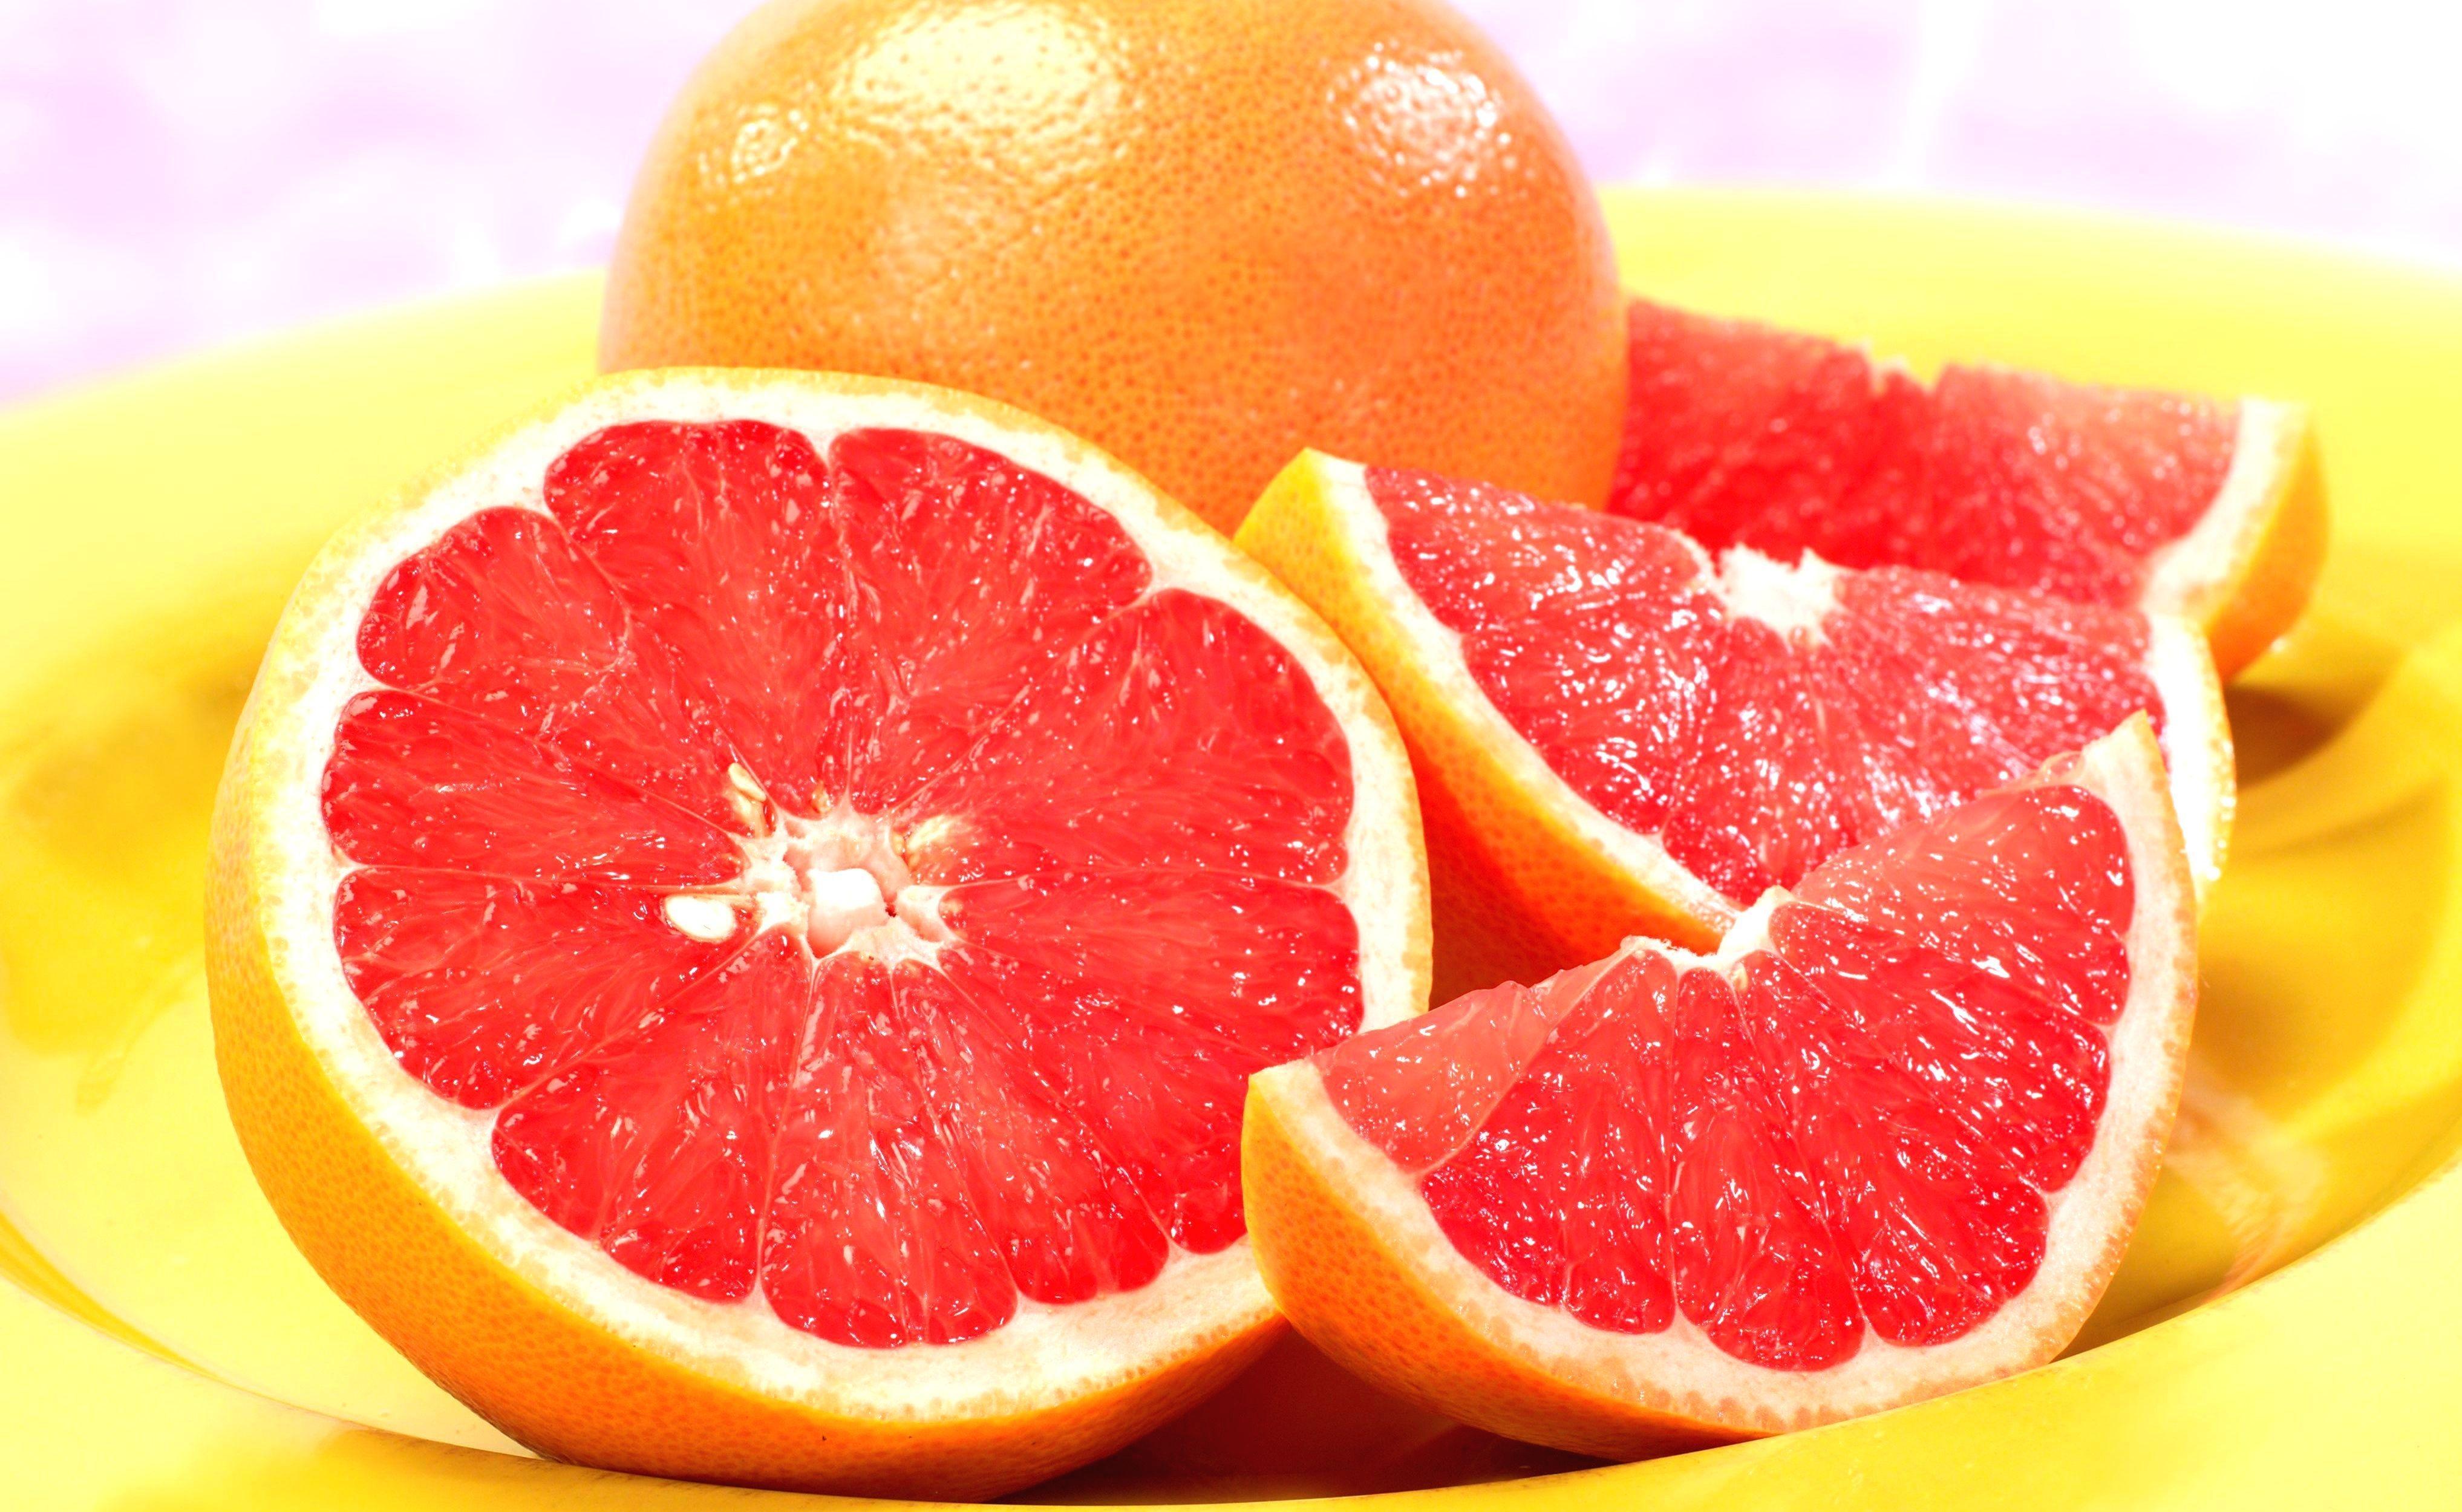 125237 free download Orange wallpapers for phone, Food, Grapefruit, Lobules, Slices, Citrus Orange images and screensavers for mobile